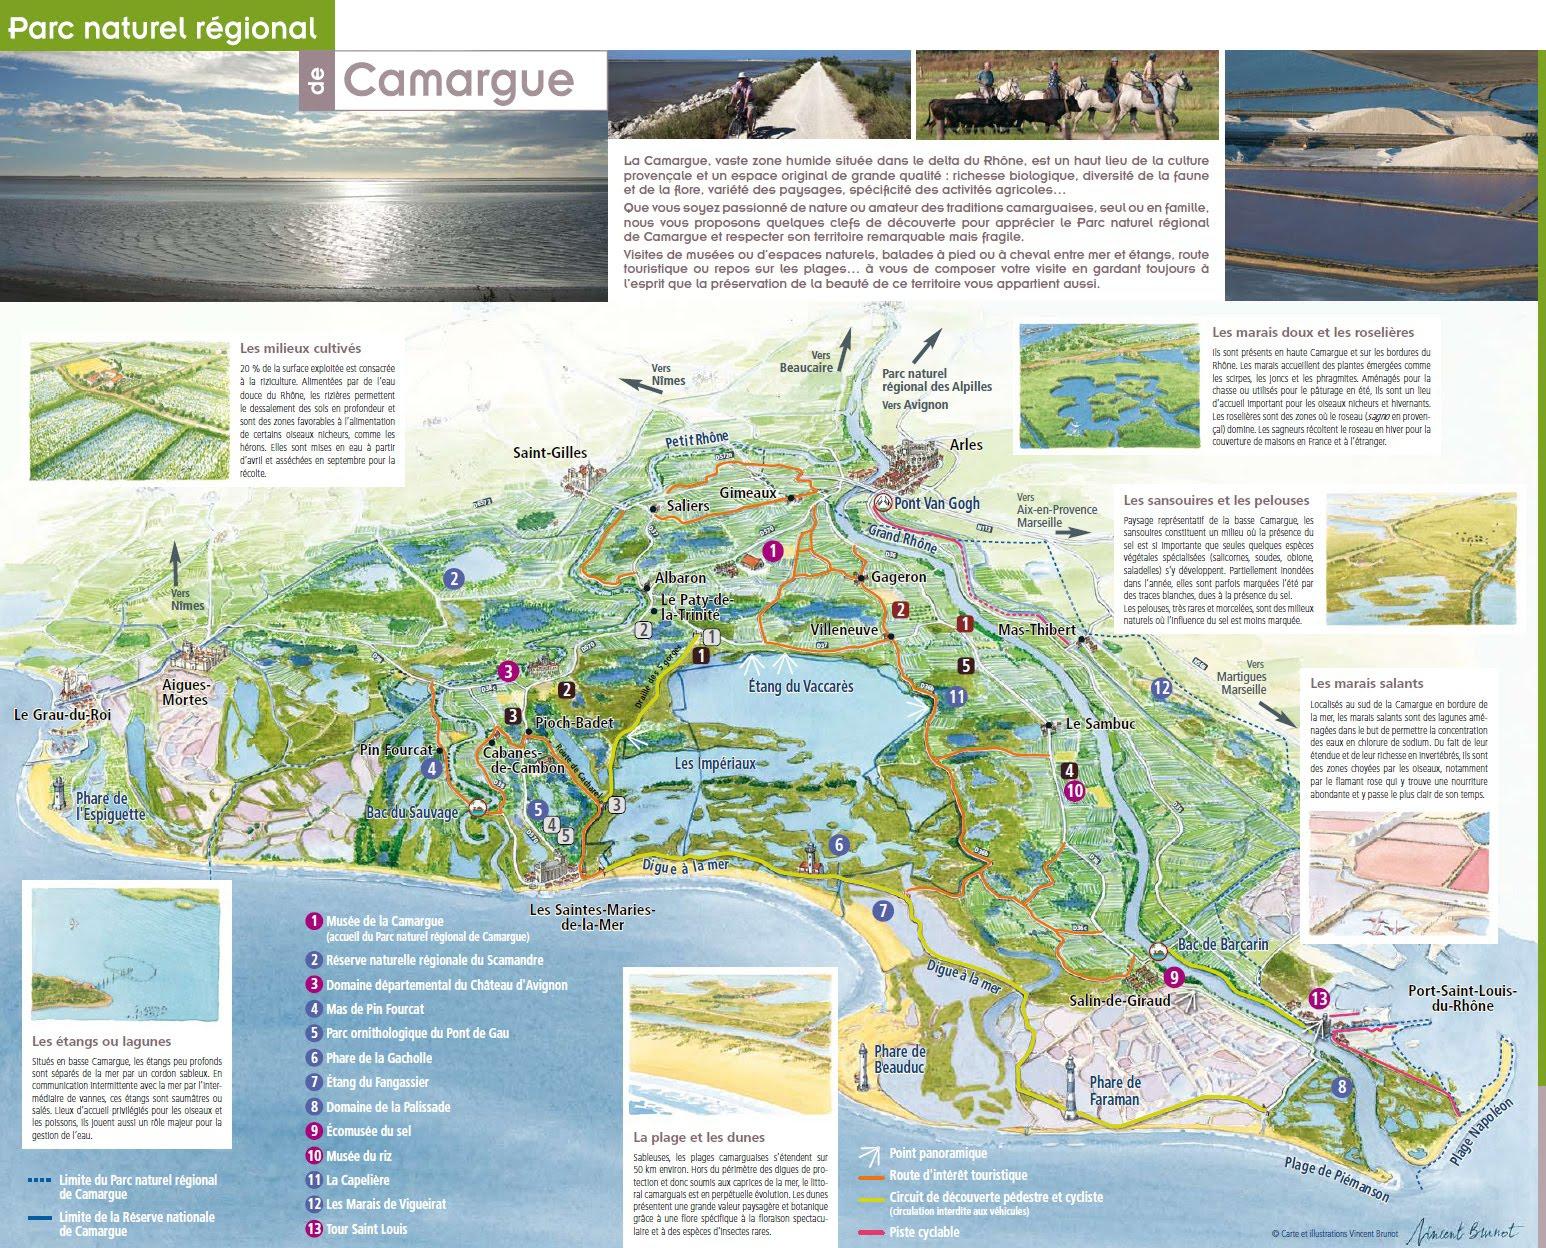 Camargue National Park - France - Blog about interesting places